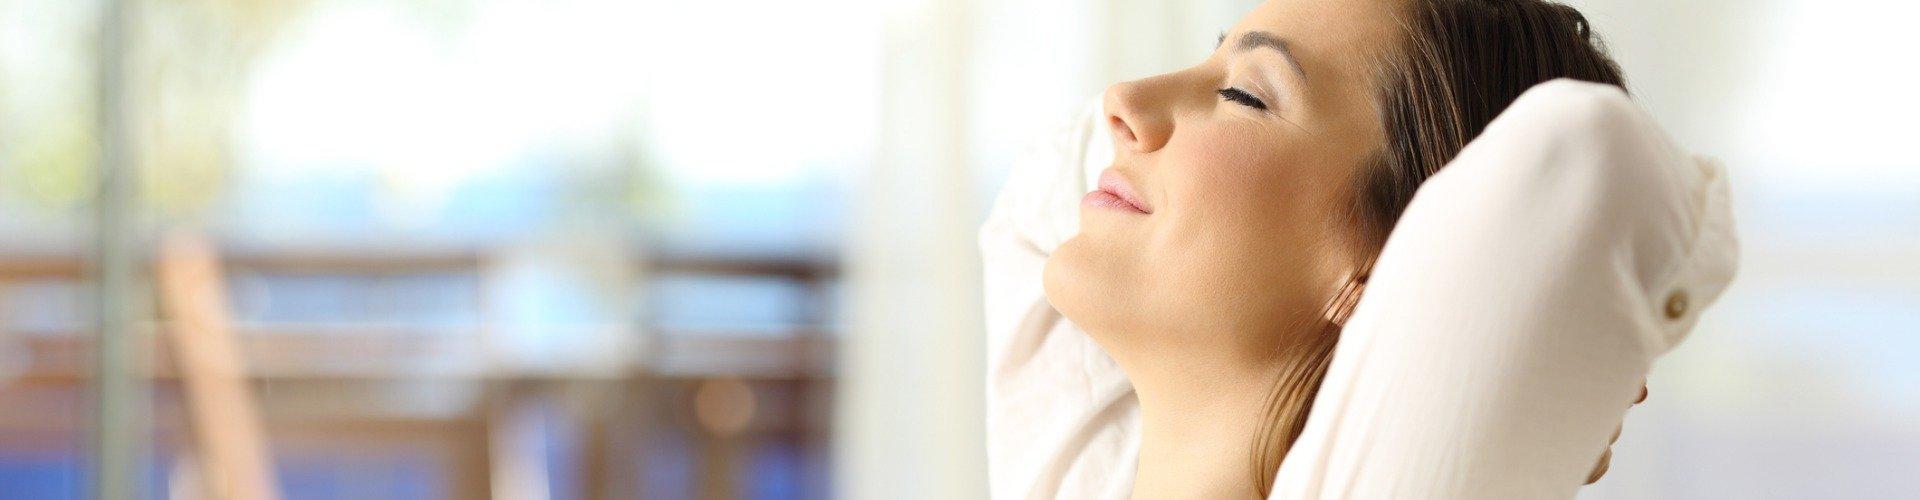 Sinus Surgery In Iran